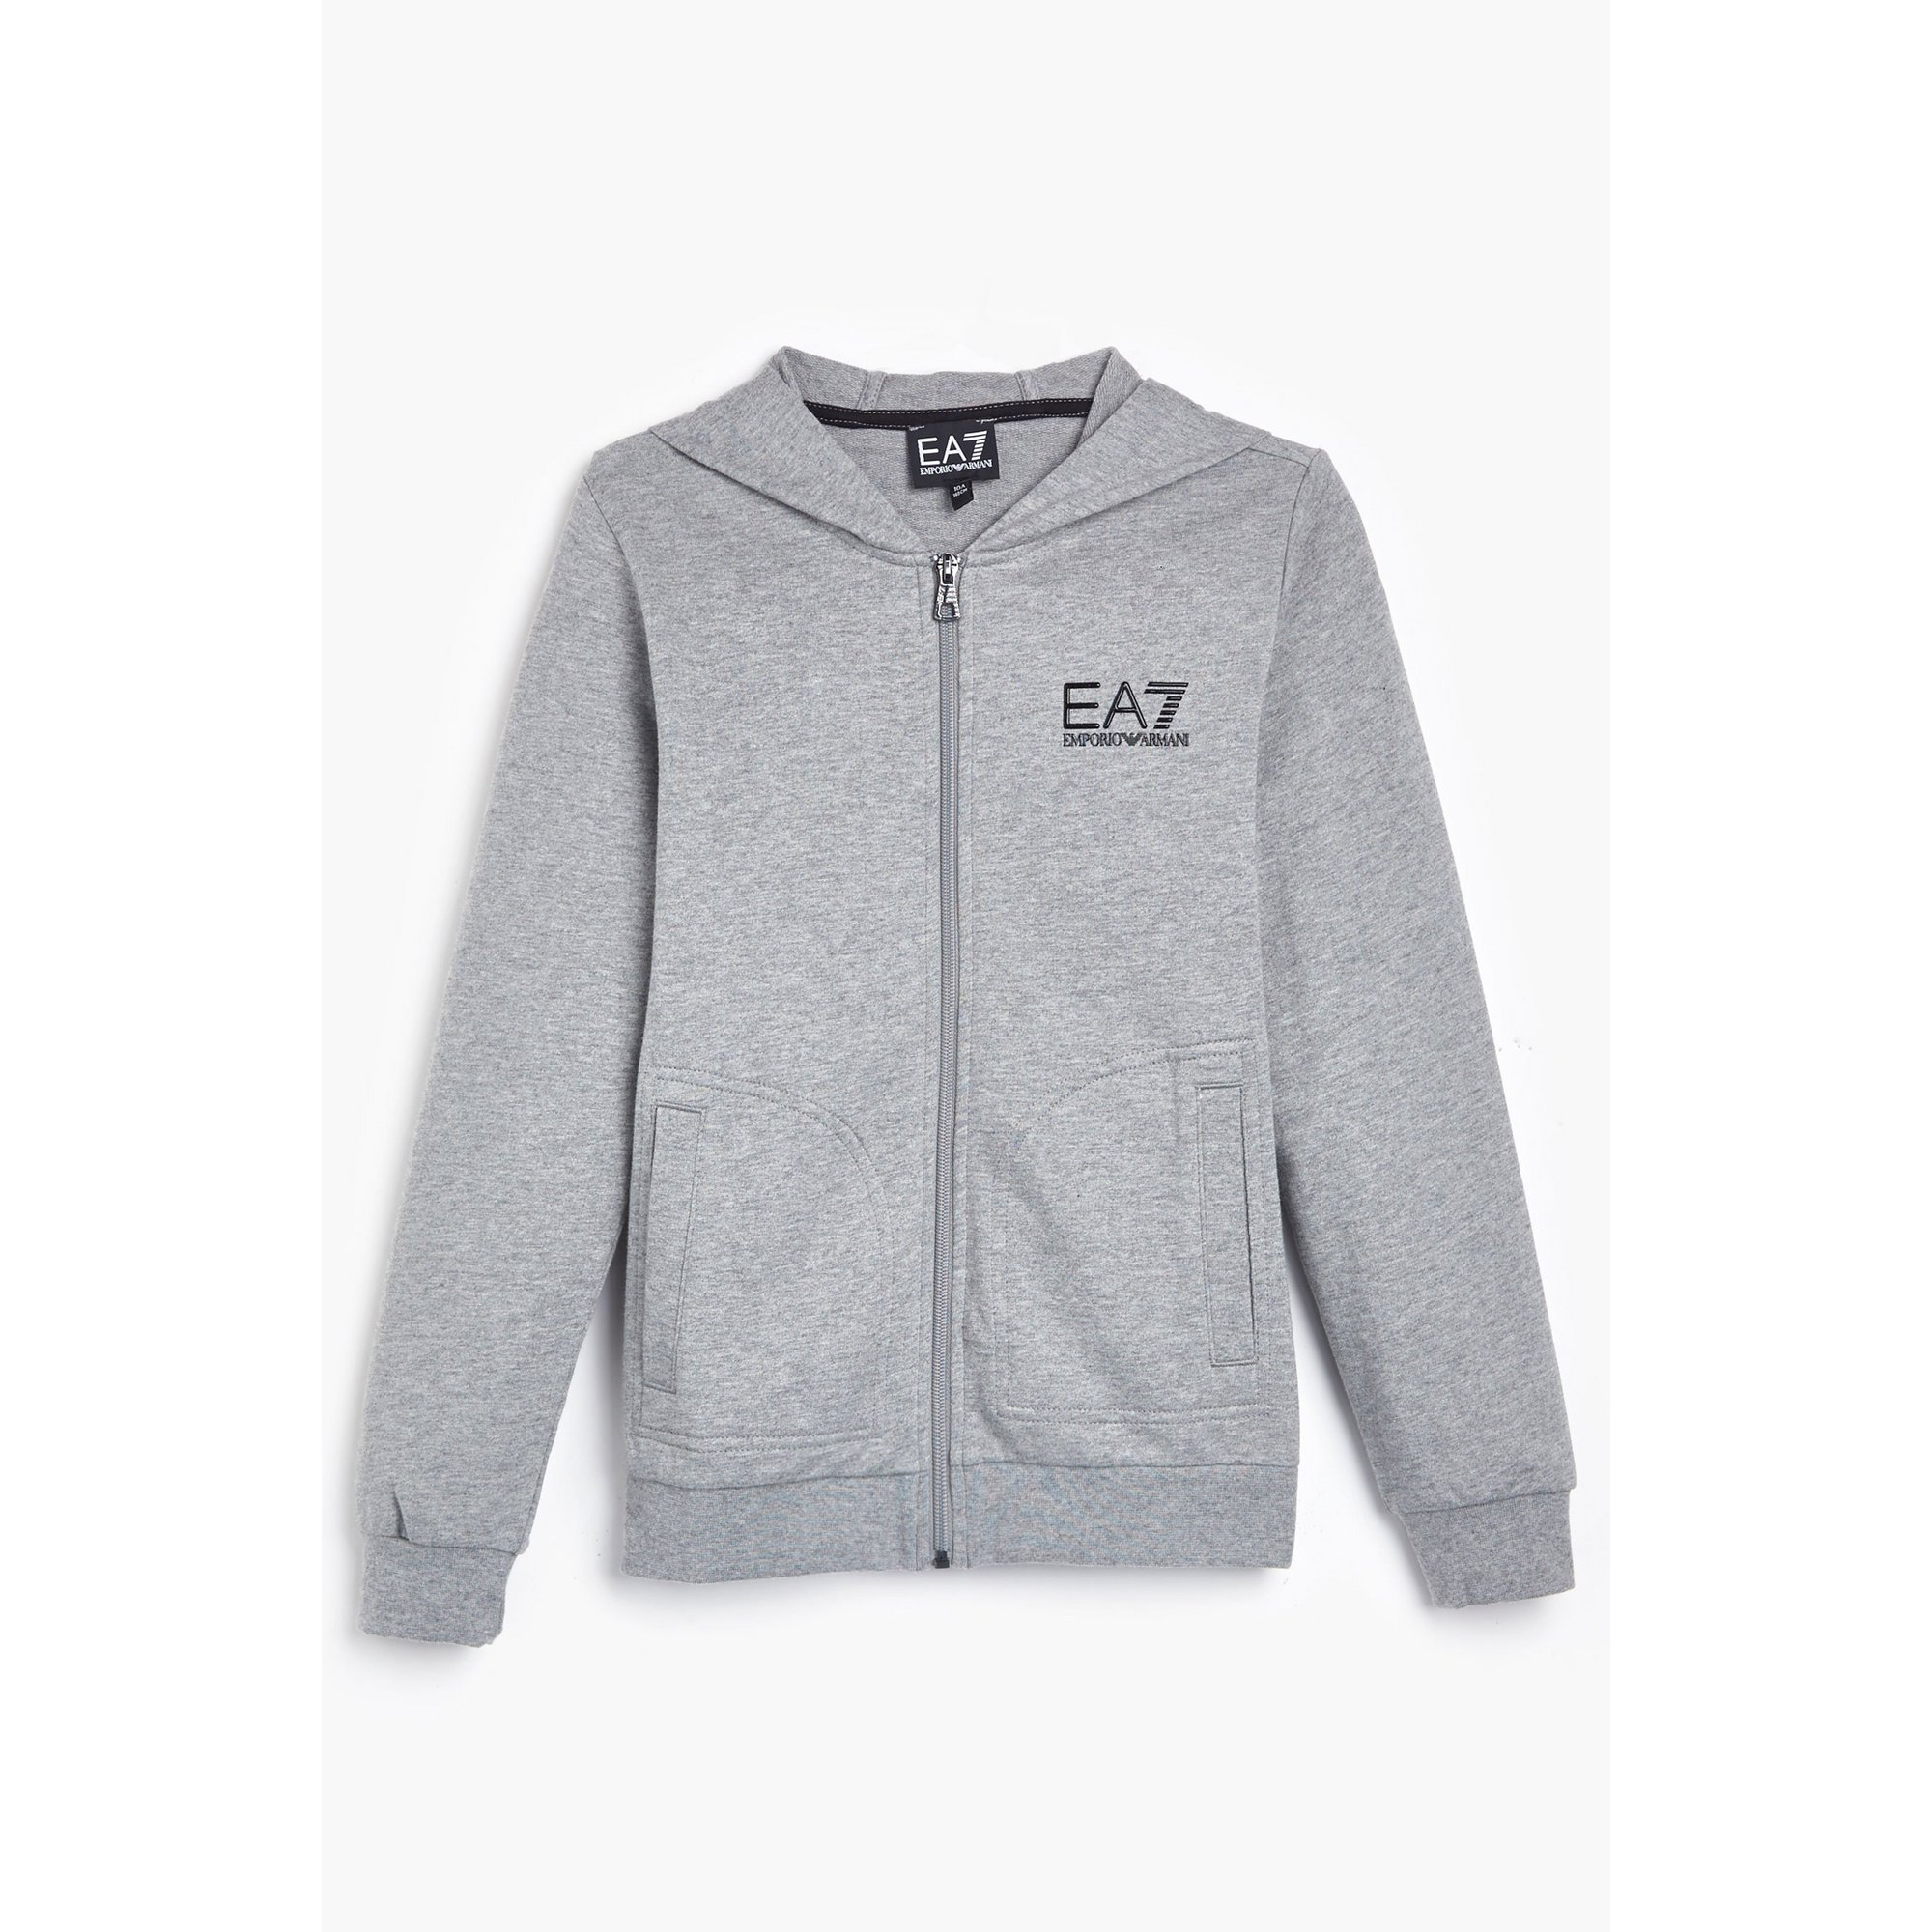 Image of Boys EA7 Train Core ID Grey Zip Through Hoody